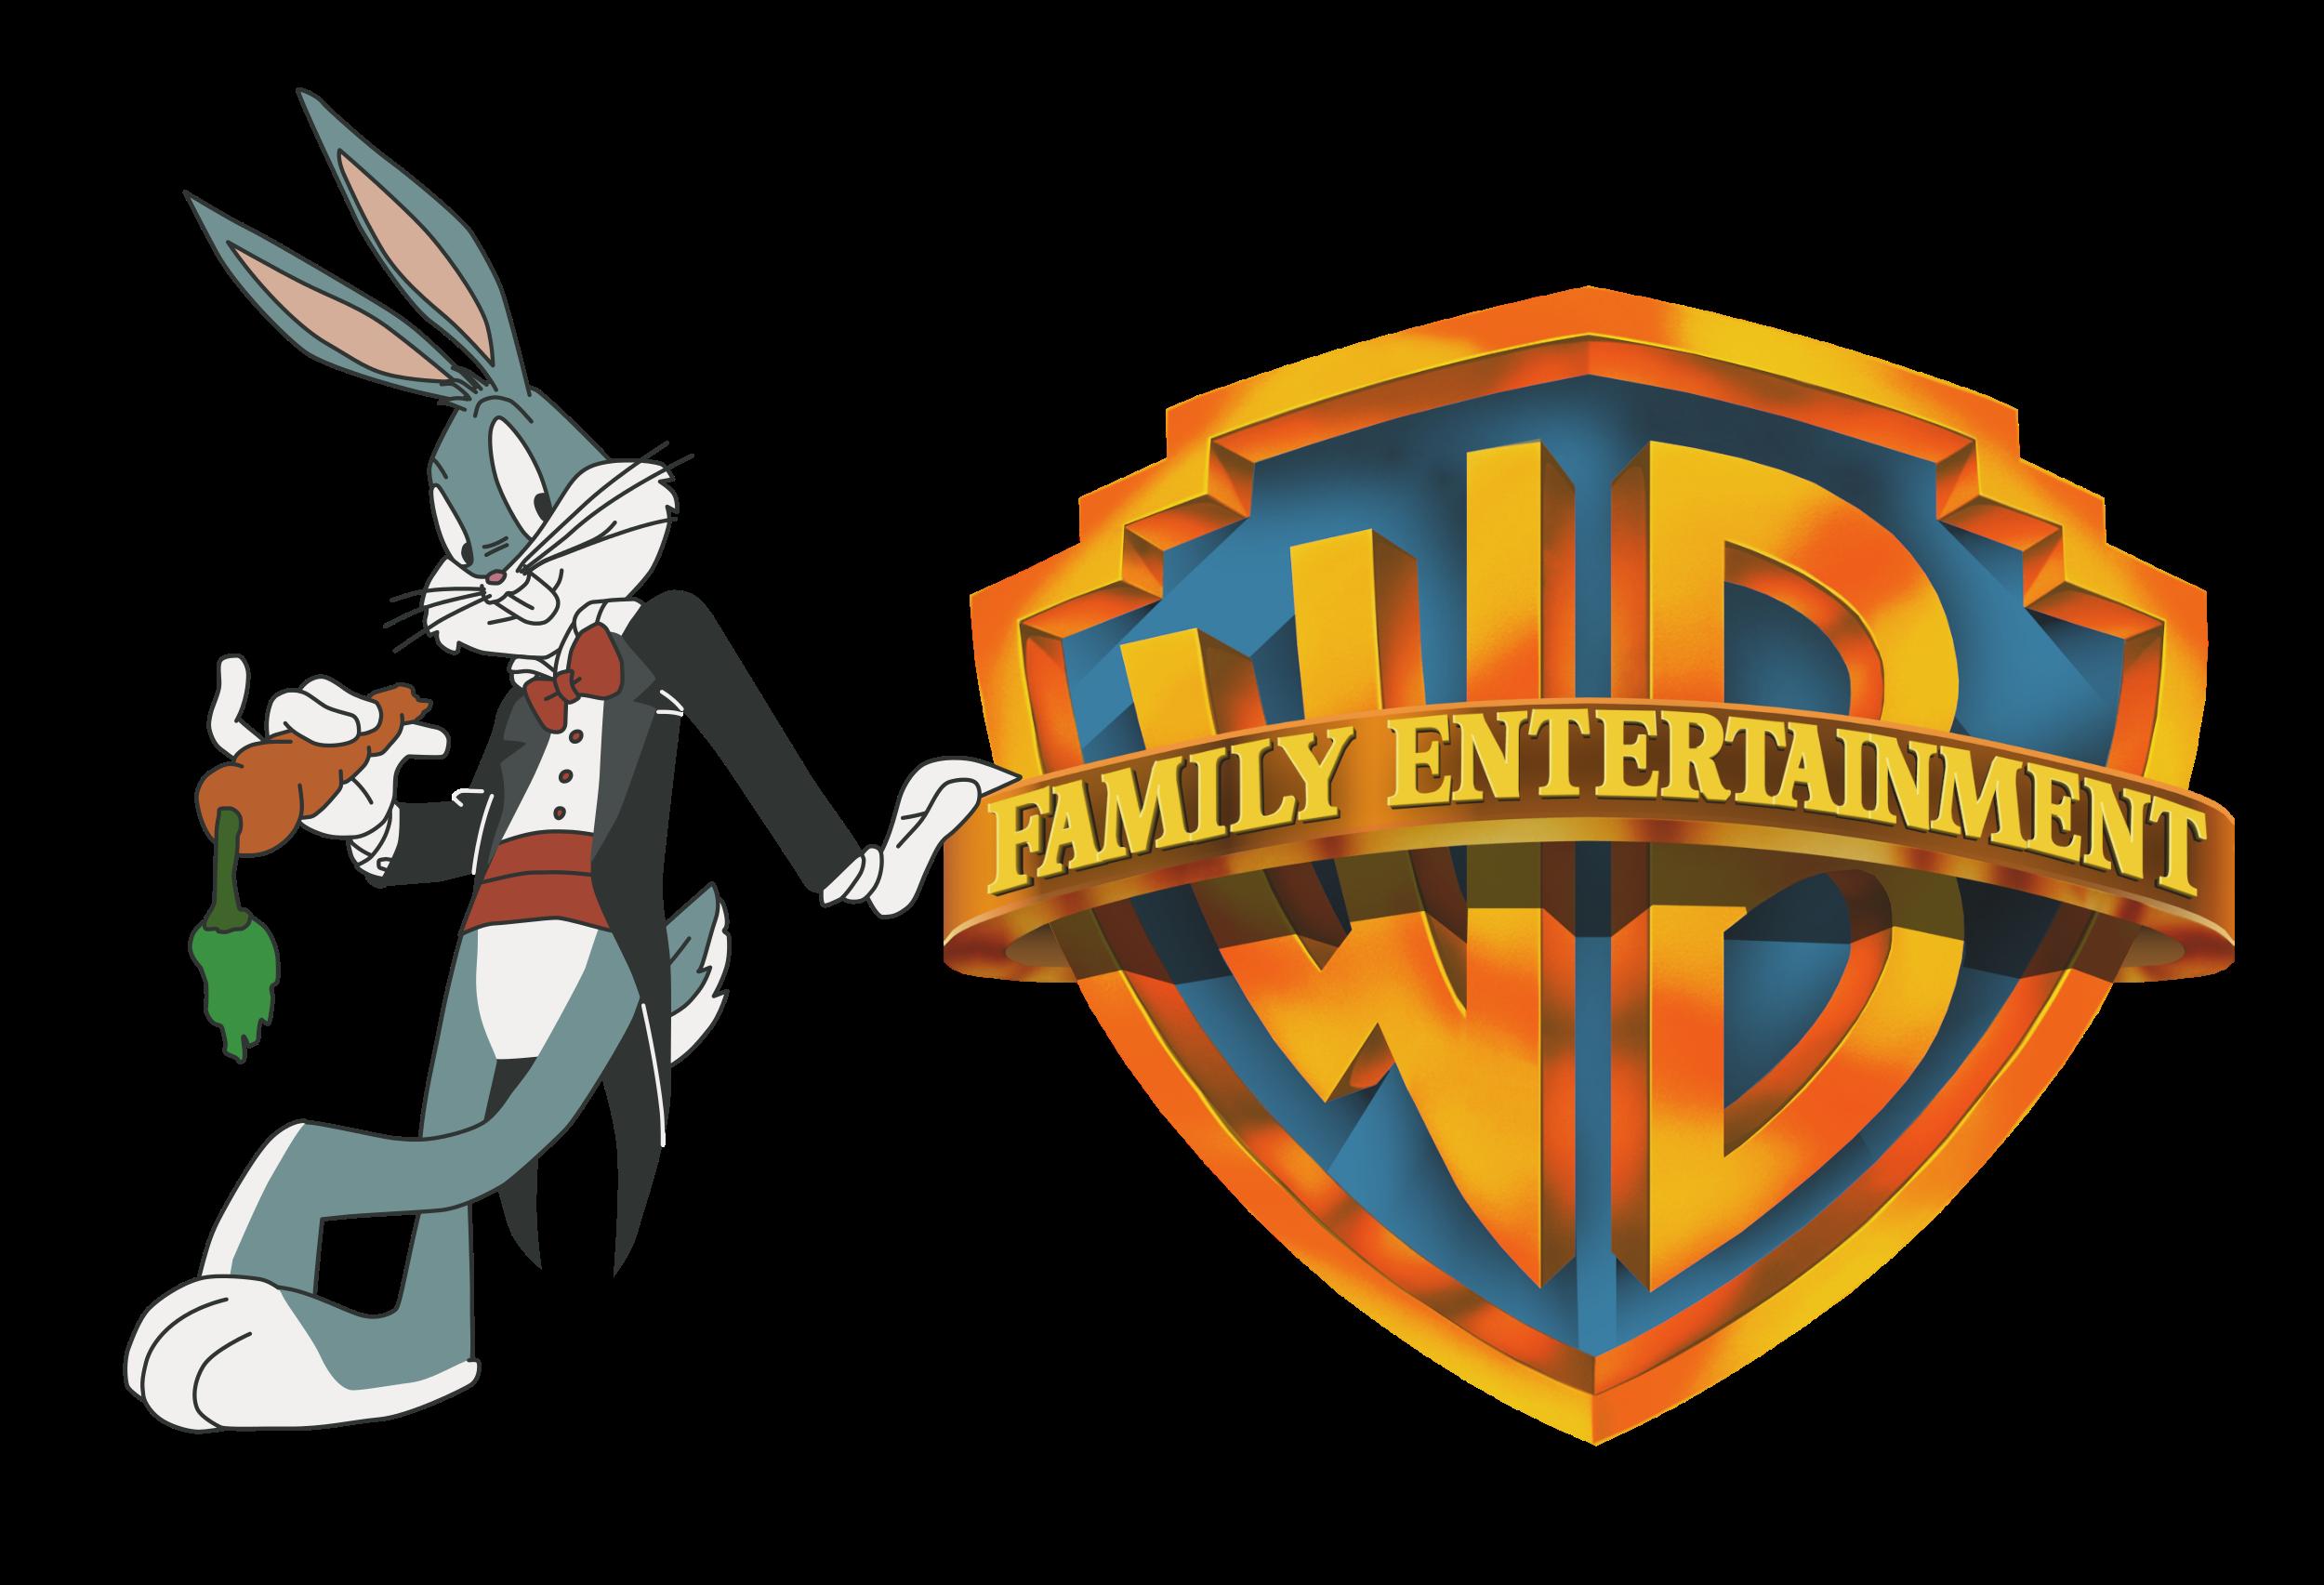 Warner Bros Family Entertainment Warner Bros Entertainment Wiki Fandom